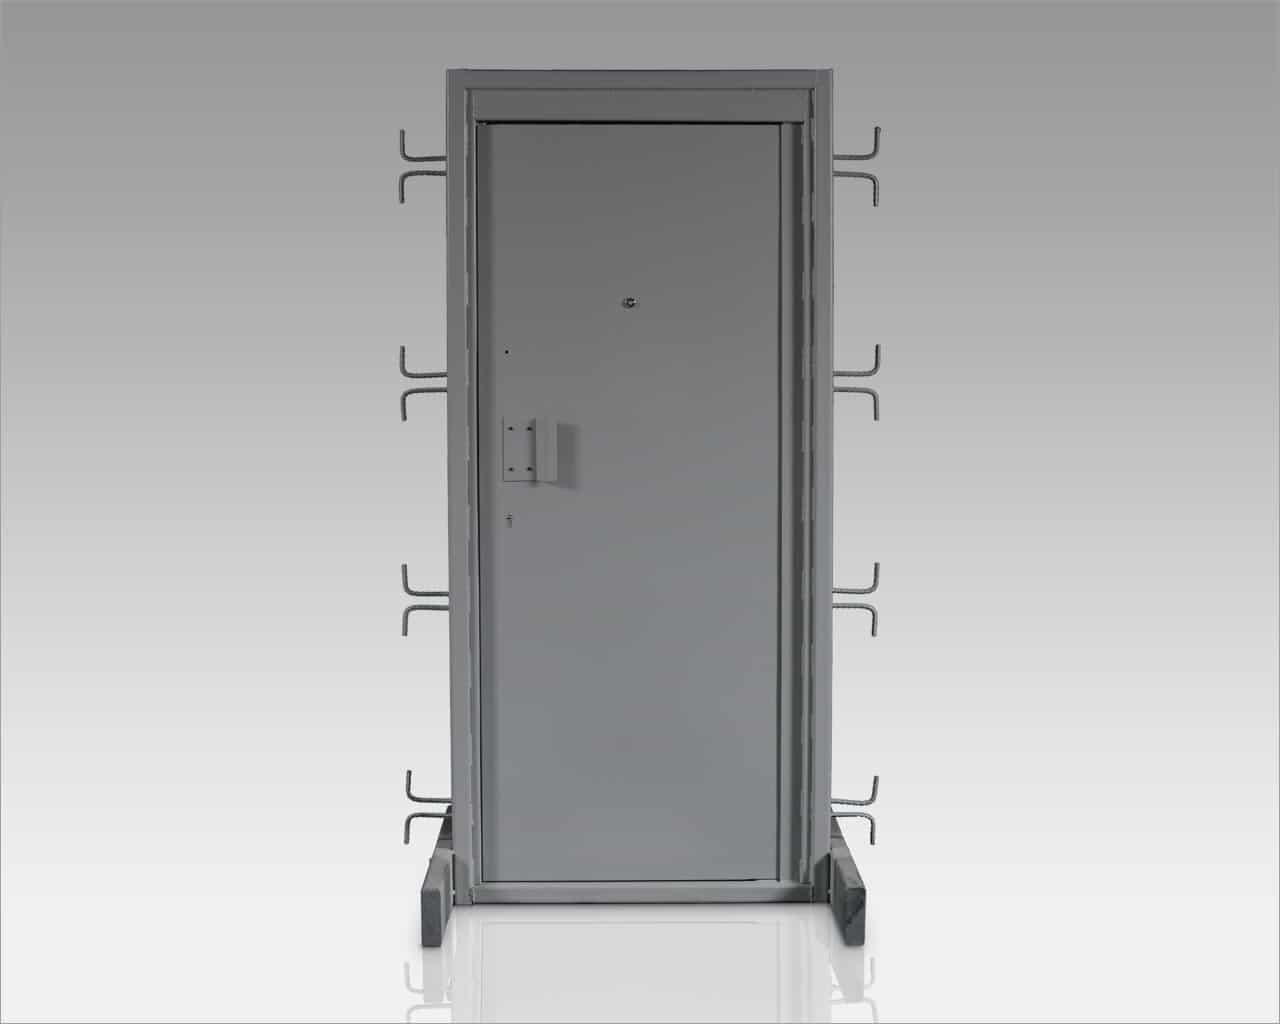 Puertas blindadas puertas de seguridad for Puertas blindadas